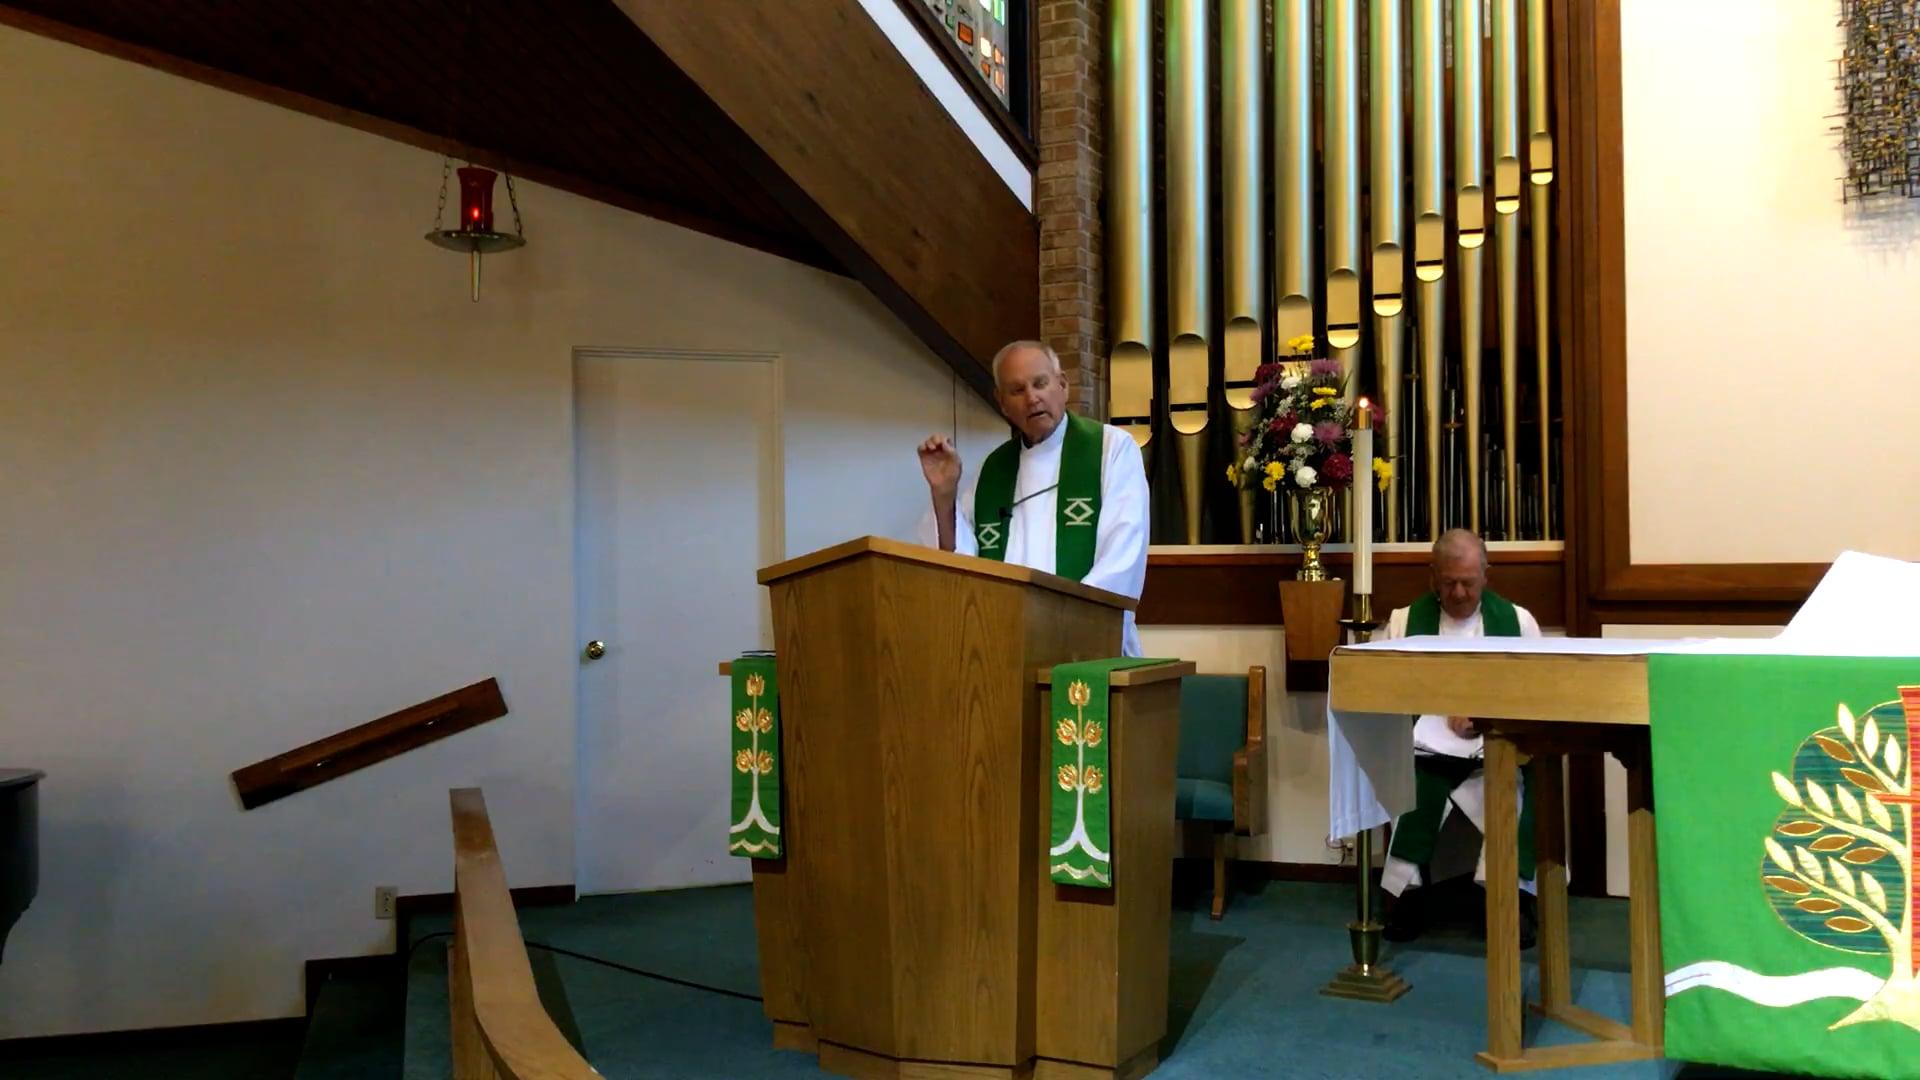 FLC Worship Service - Oct. 10, 2021